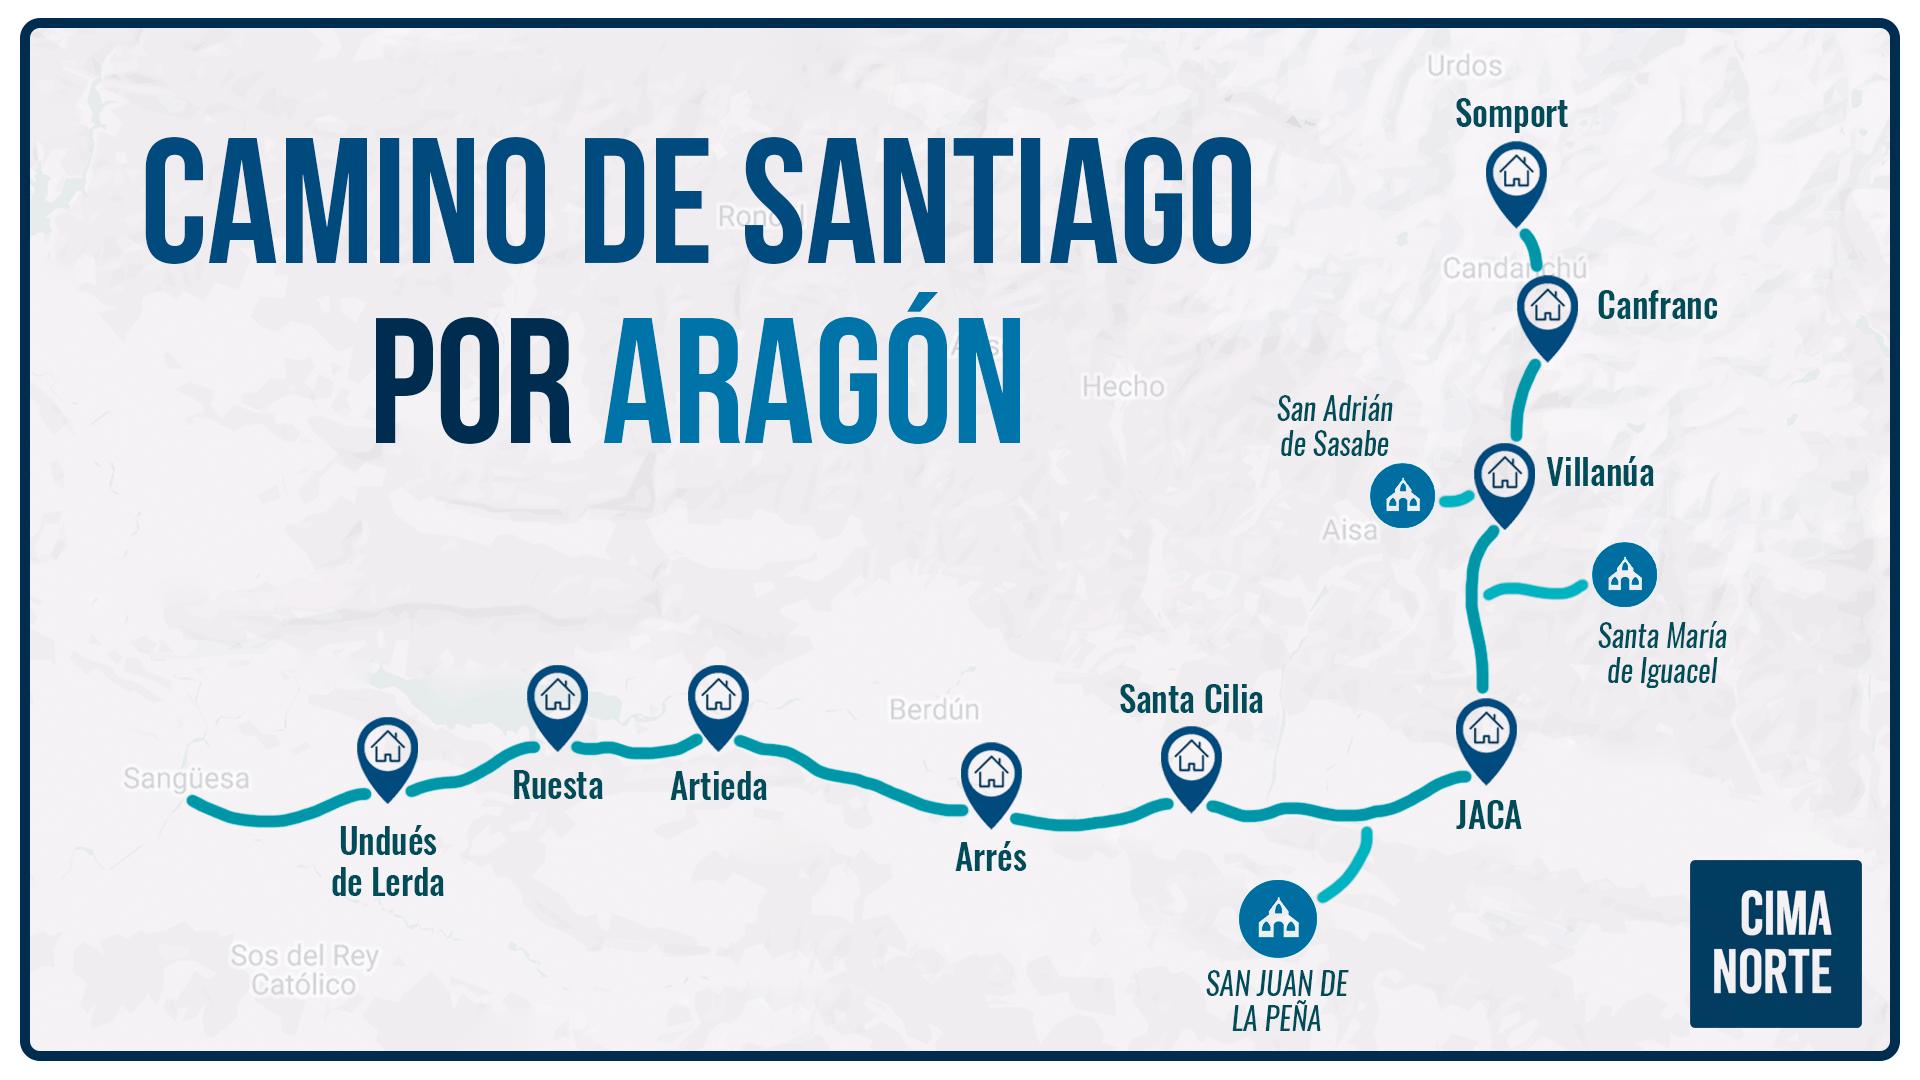 camino de santiago por aragón mapa recorrido etapas